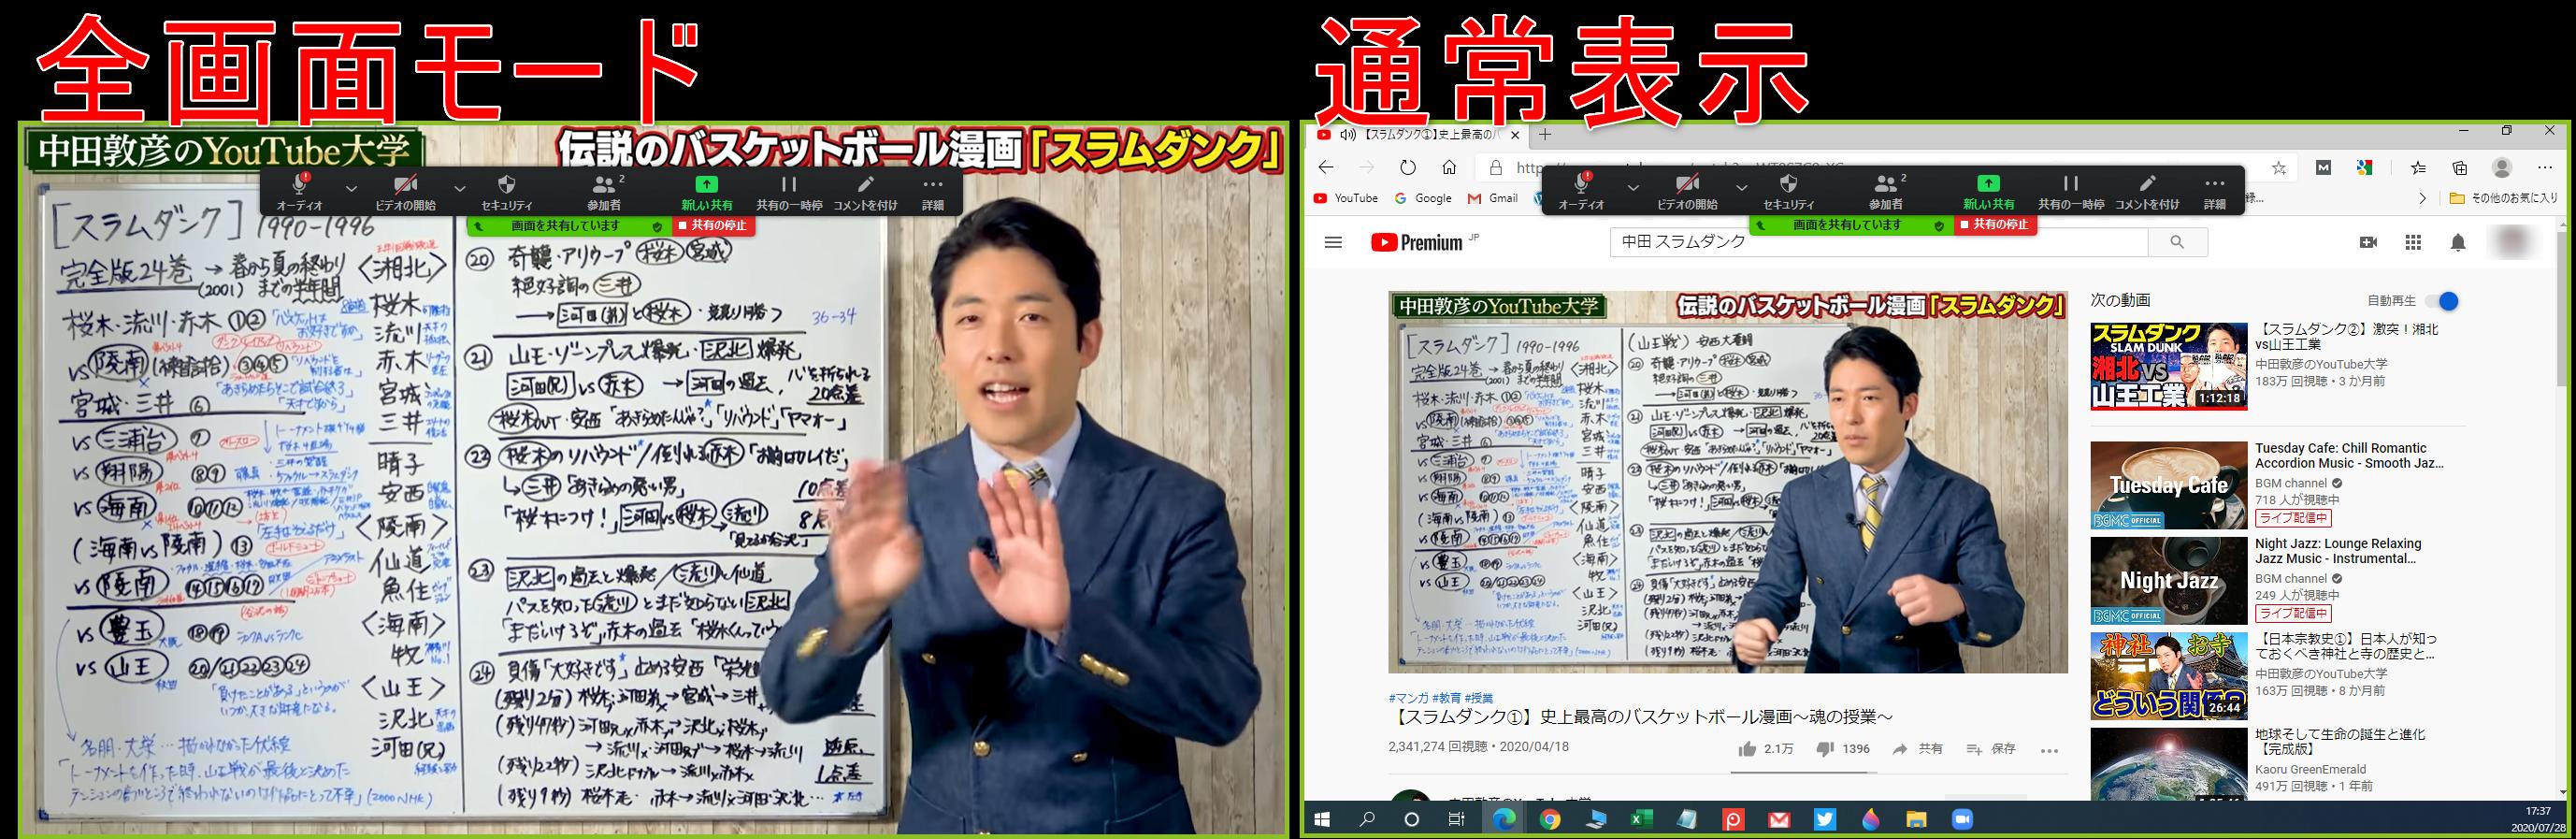 YouTube再生形式